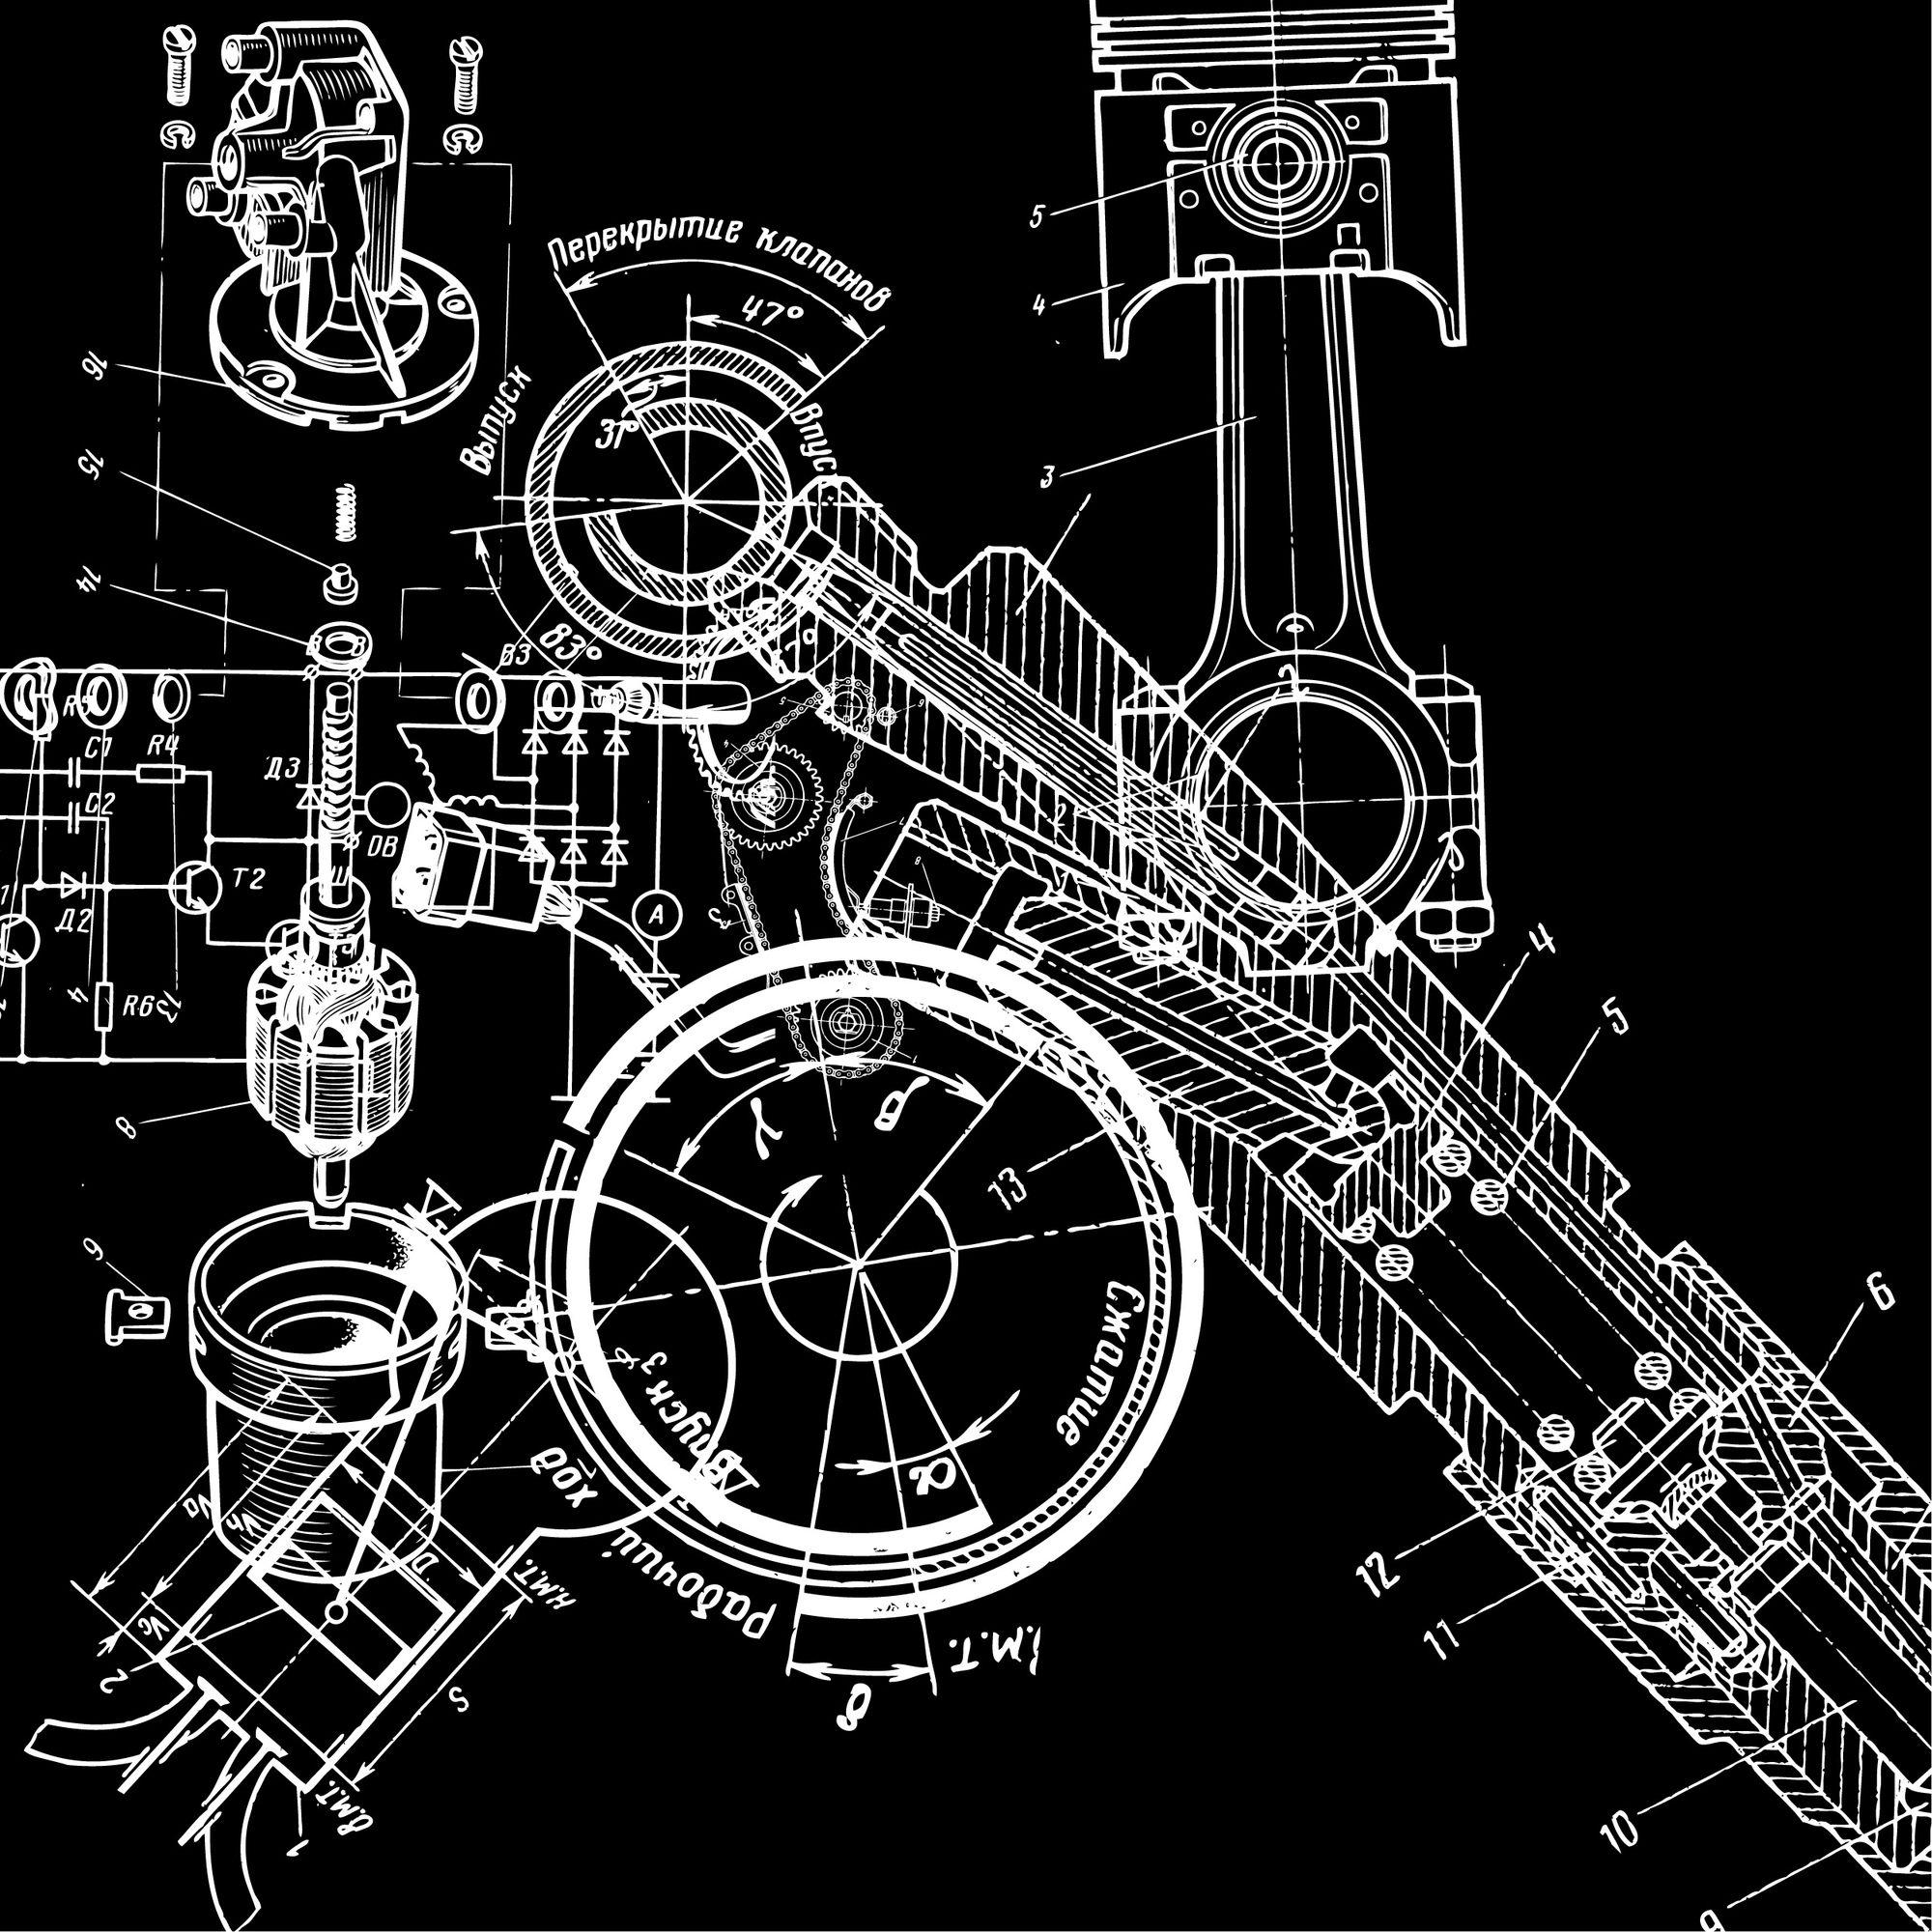 Technical drawing or blueprint on black background blueprints technical drawing stock vector clipart technical drawing or blueprint on black background by alekup malvernweather Choice Image